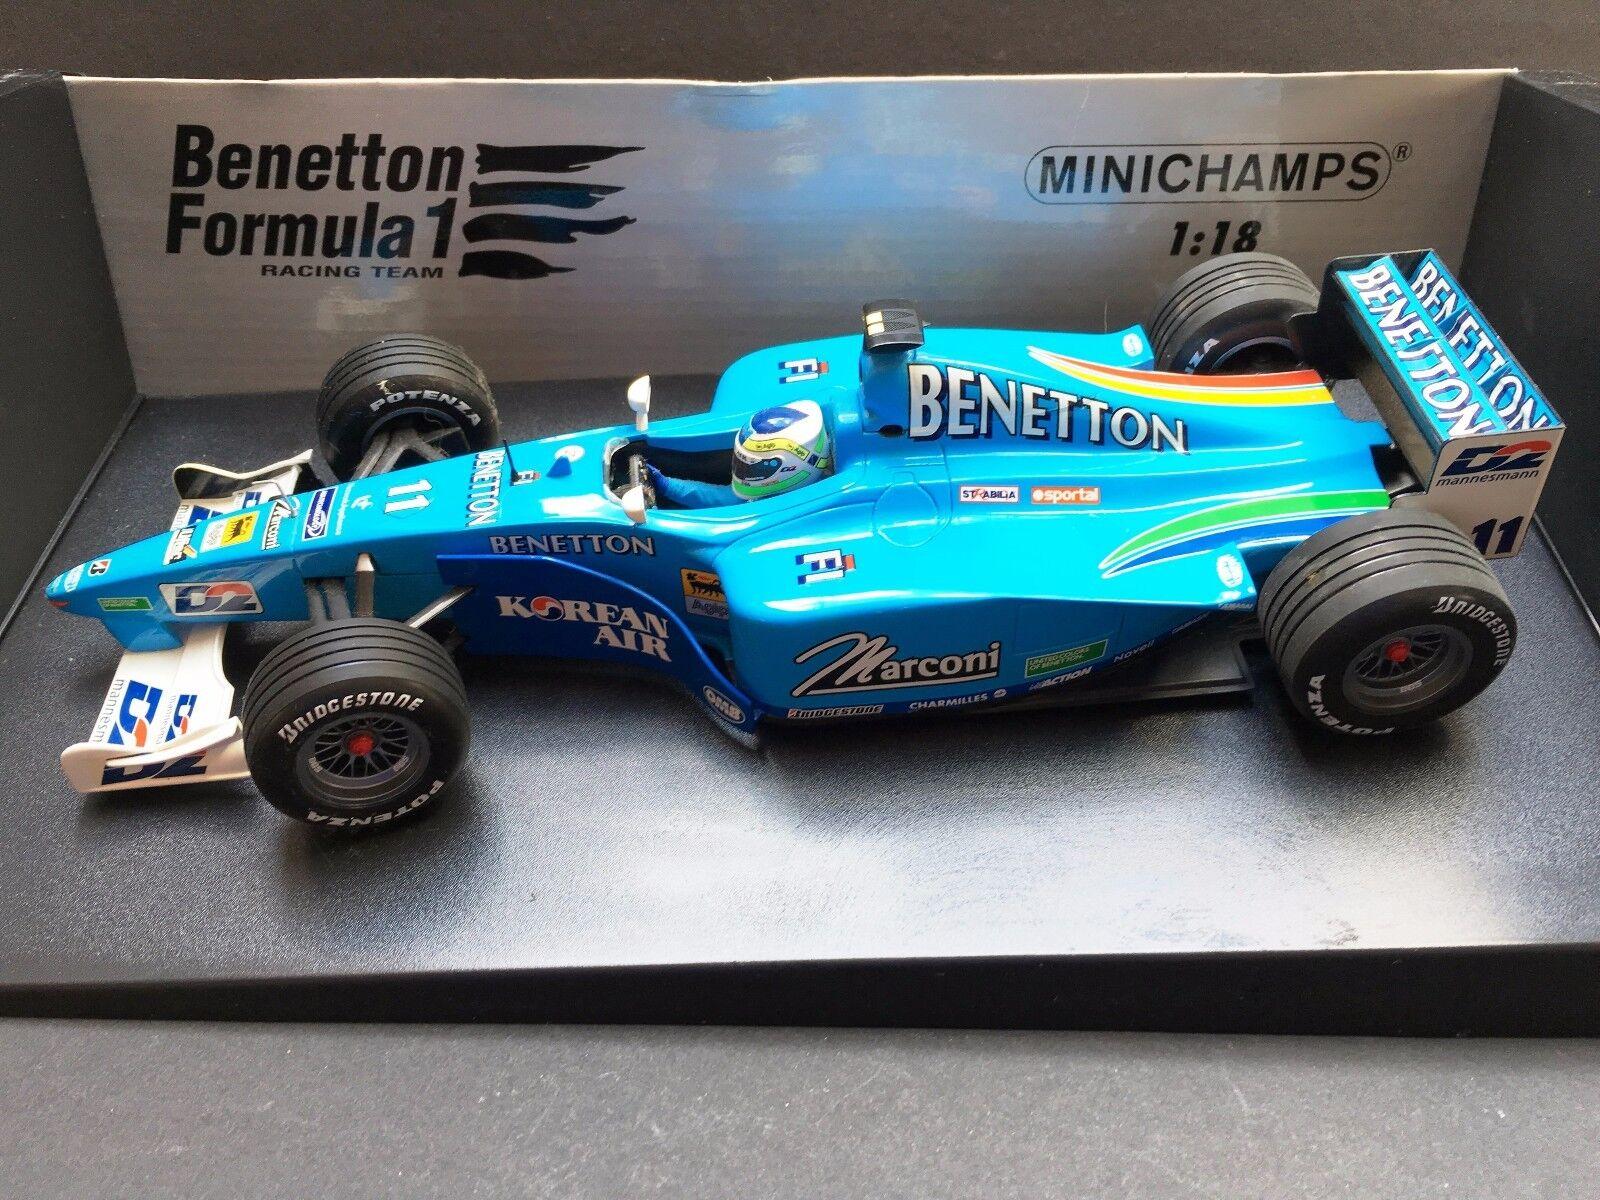 Minichamps - Giancarlo Fisichella - Benetton - B200 -  2000 - 1 18